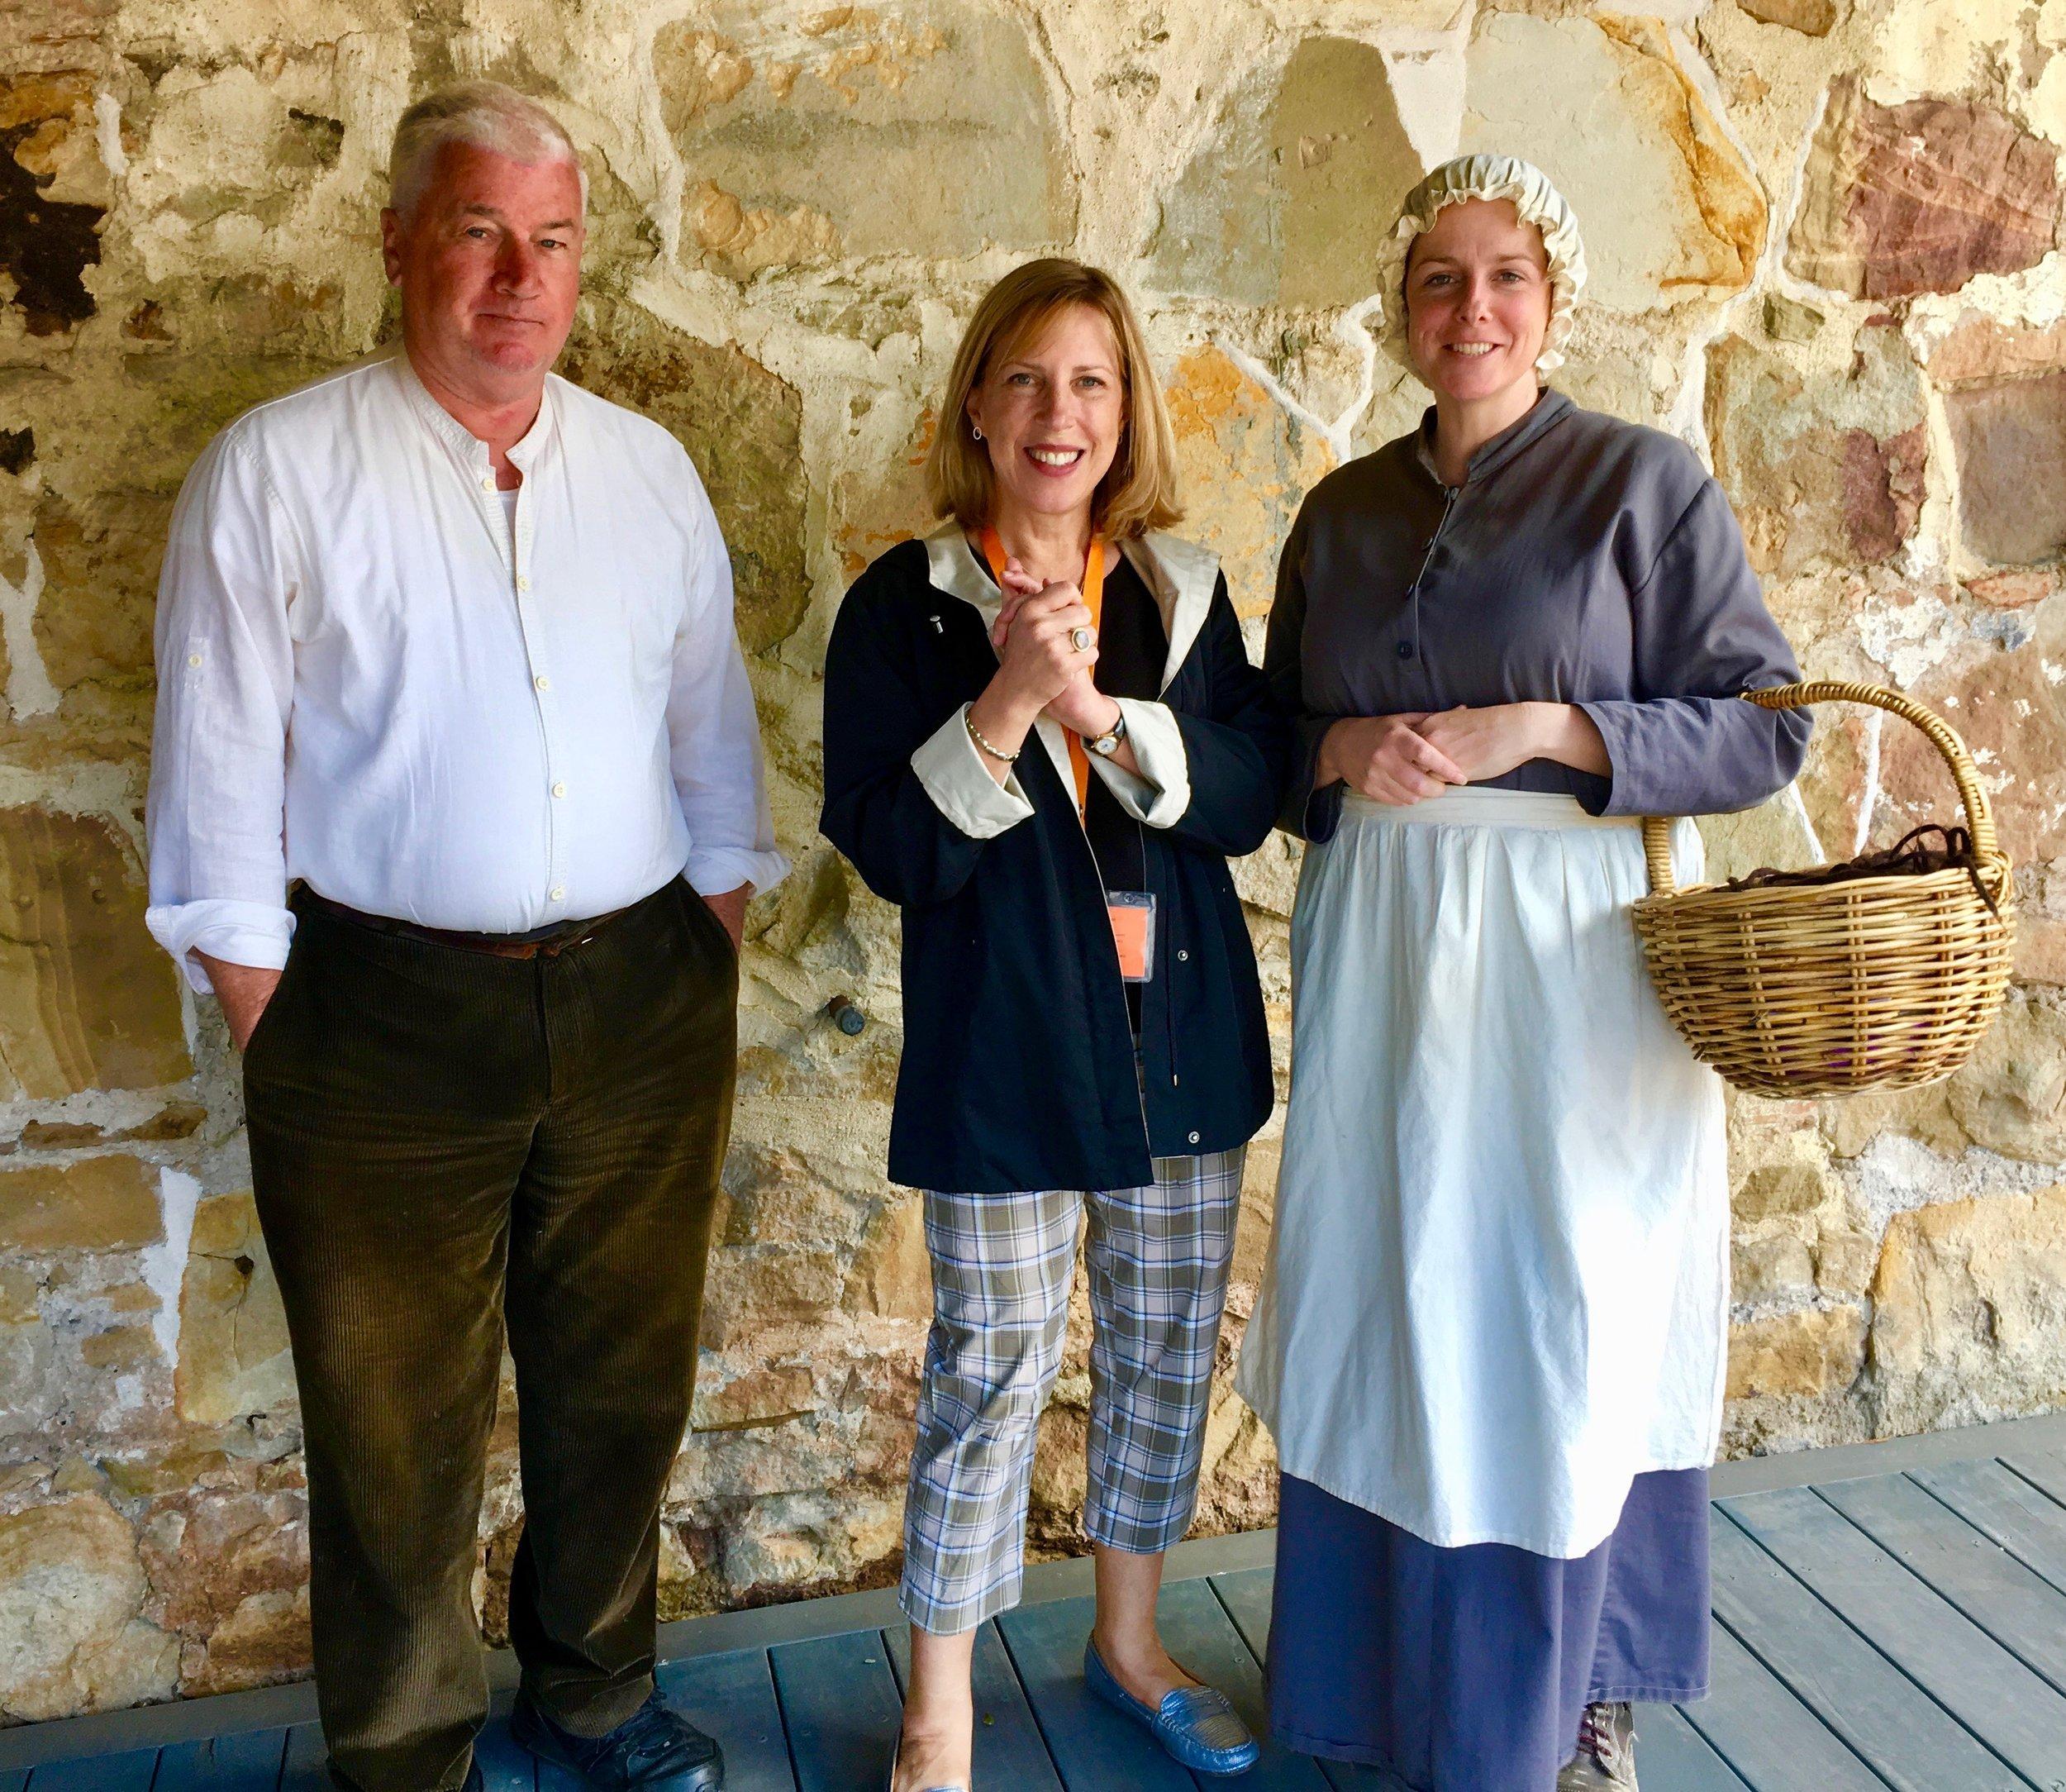 EXCLUSIVE SNEAK PEEK OF CHRISTINA BAKER KLINE'S NEW NOVEL